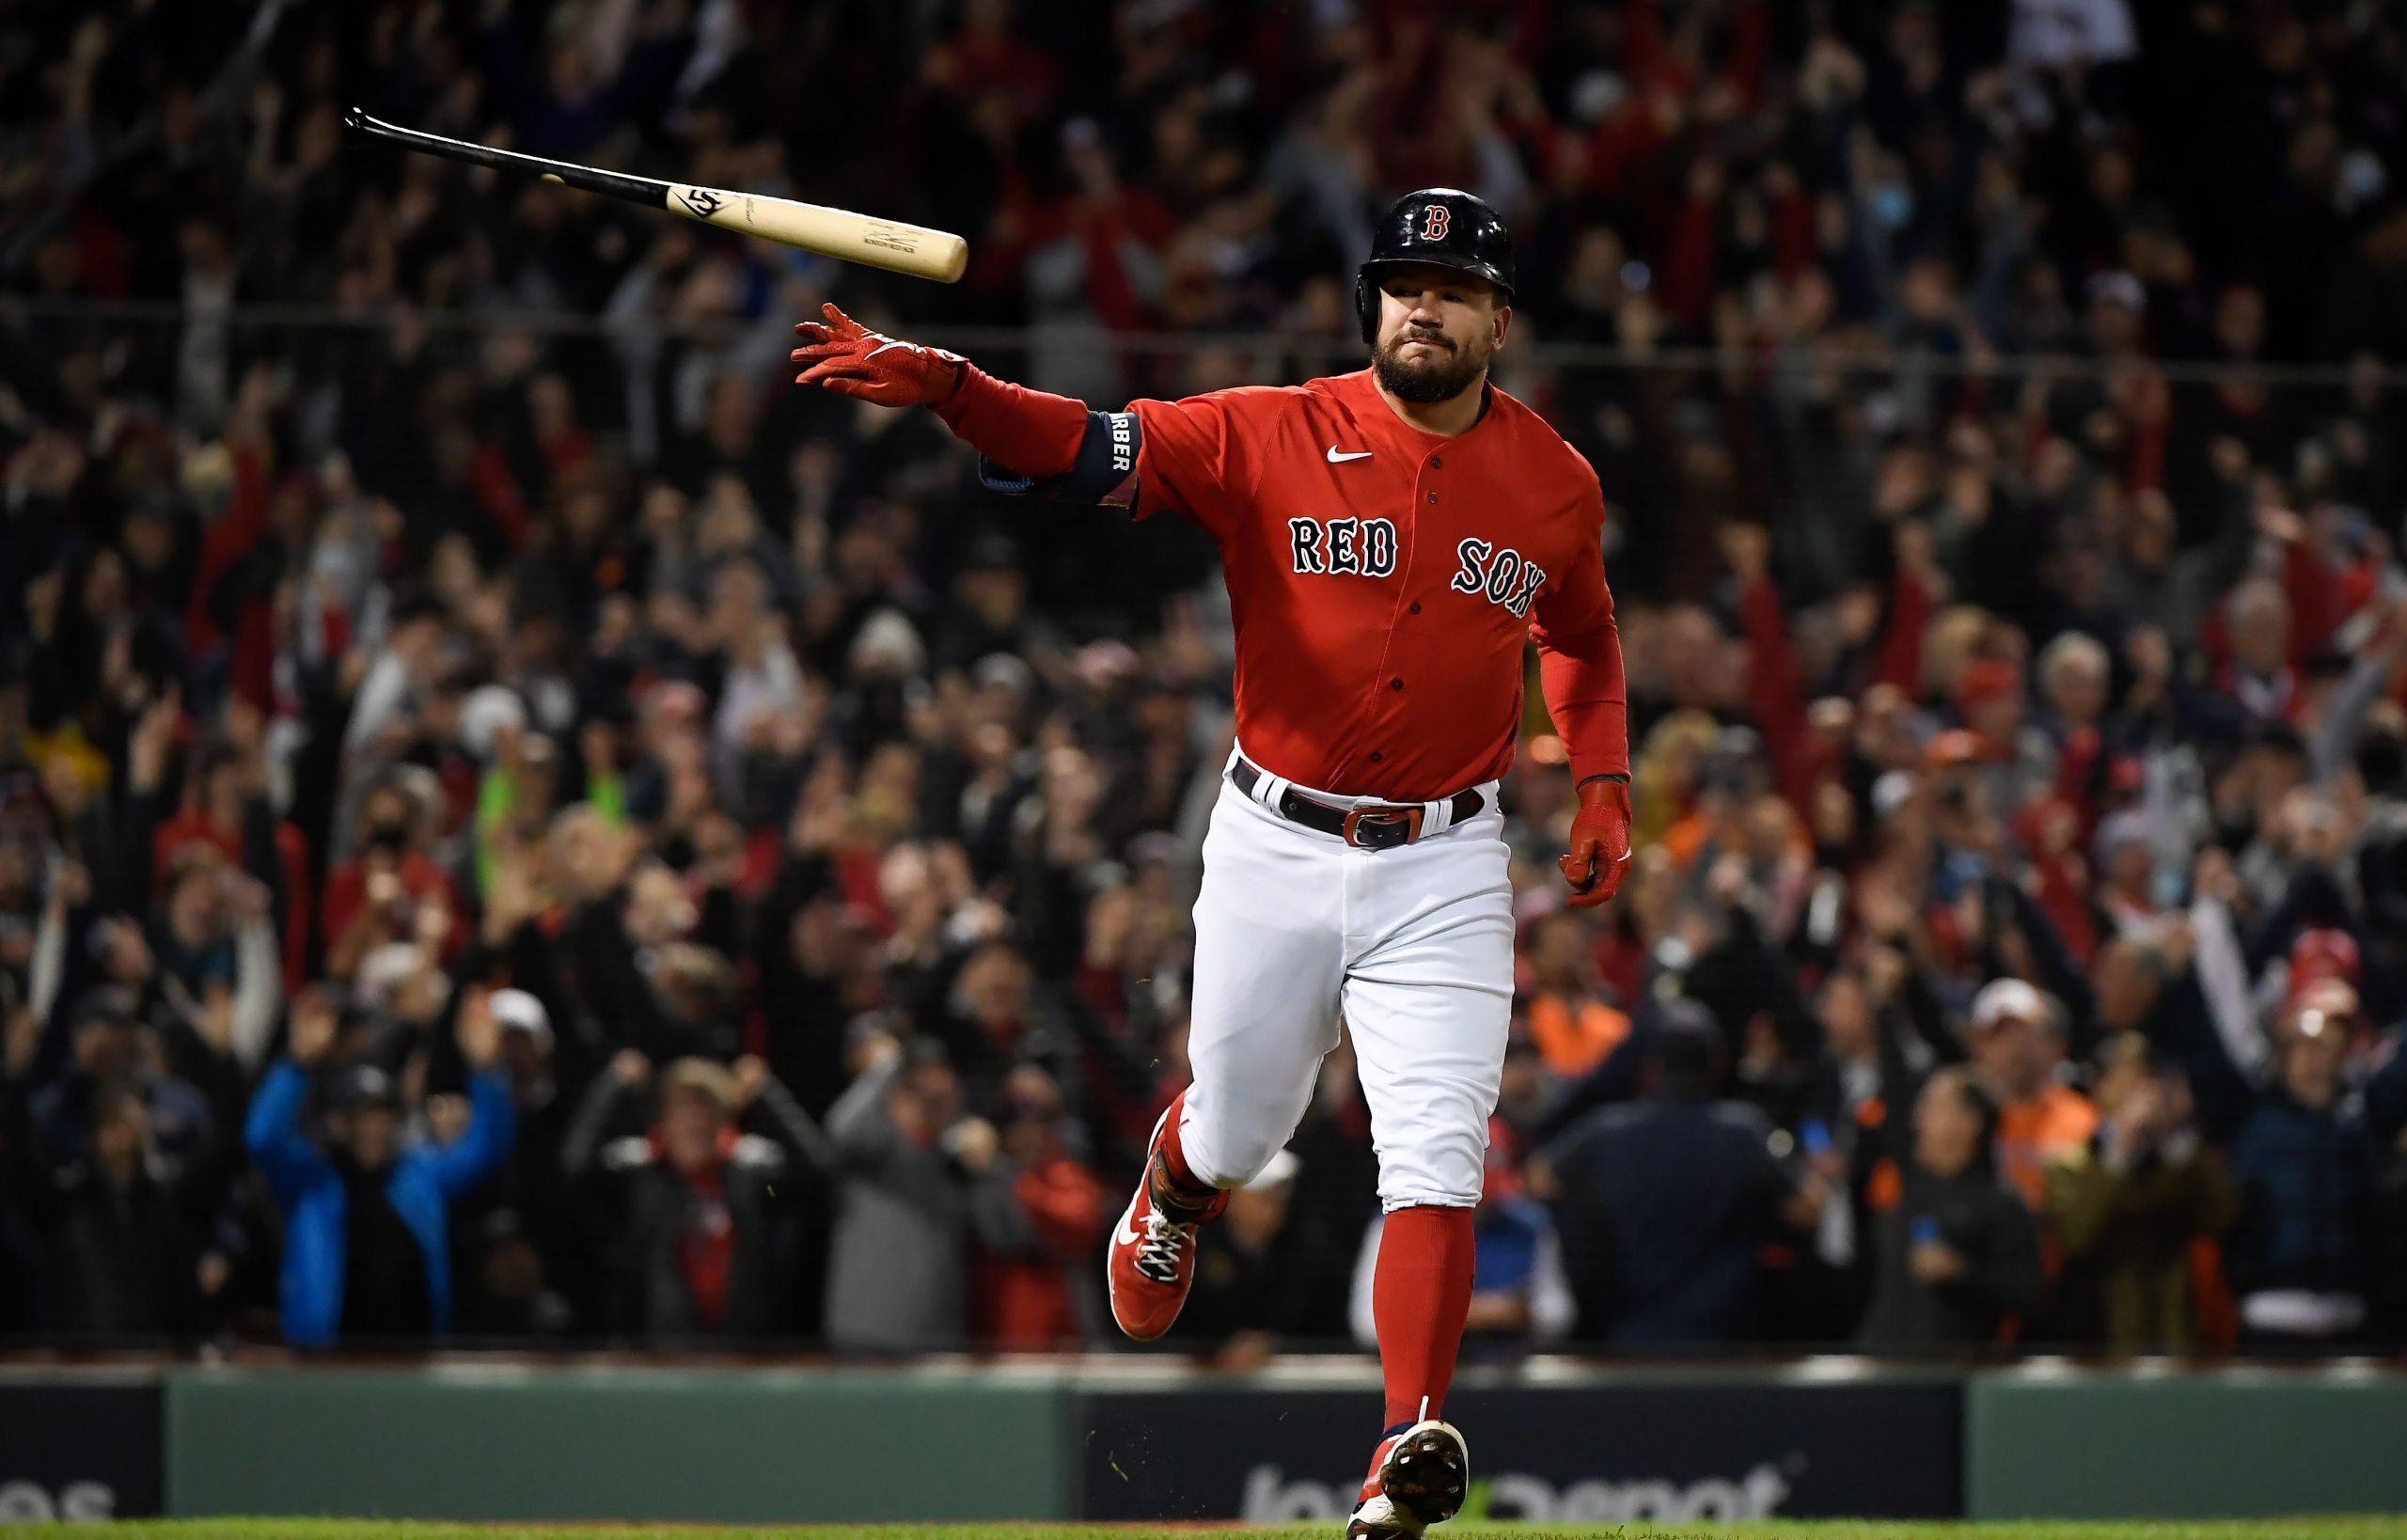 Kyle Schwarber crushes grand slam in ALCS Game 3, Red Sox set postseason slam record